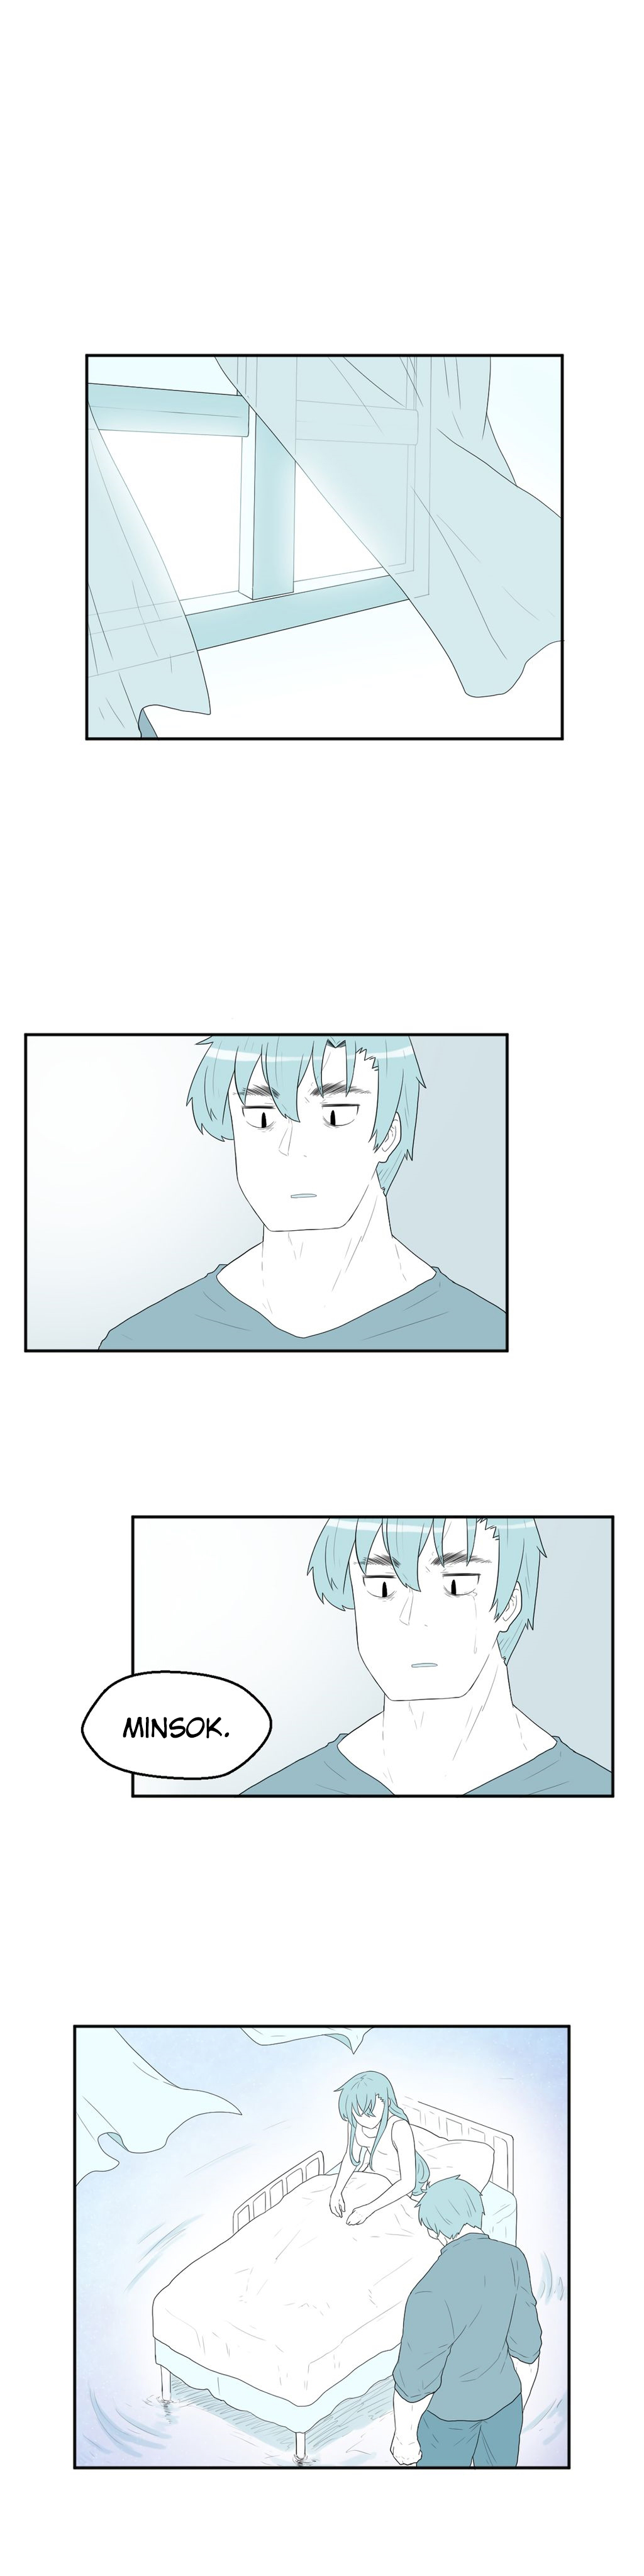 https://nine.mangadogs.com/fr_manga/pic1/54/2102/75345/AllDayJoAyoung15VF_0_94.jpg Page 1